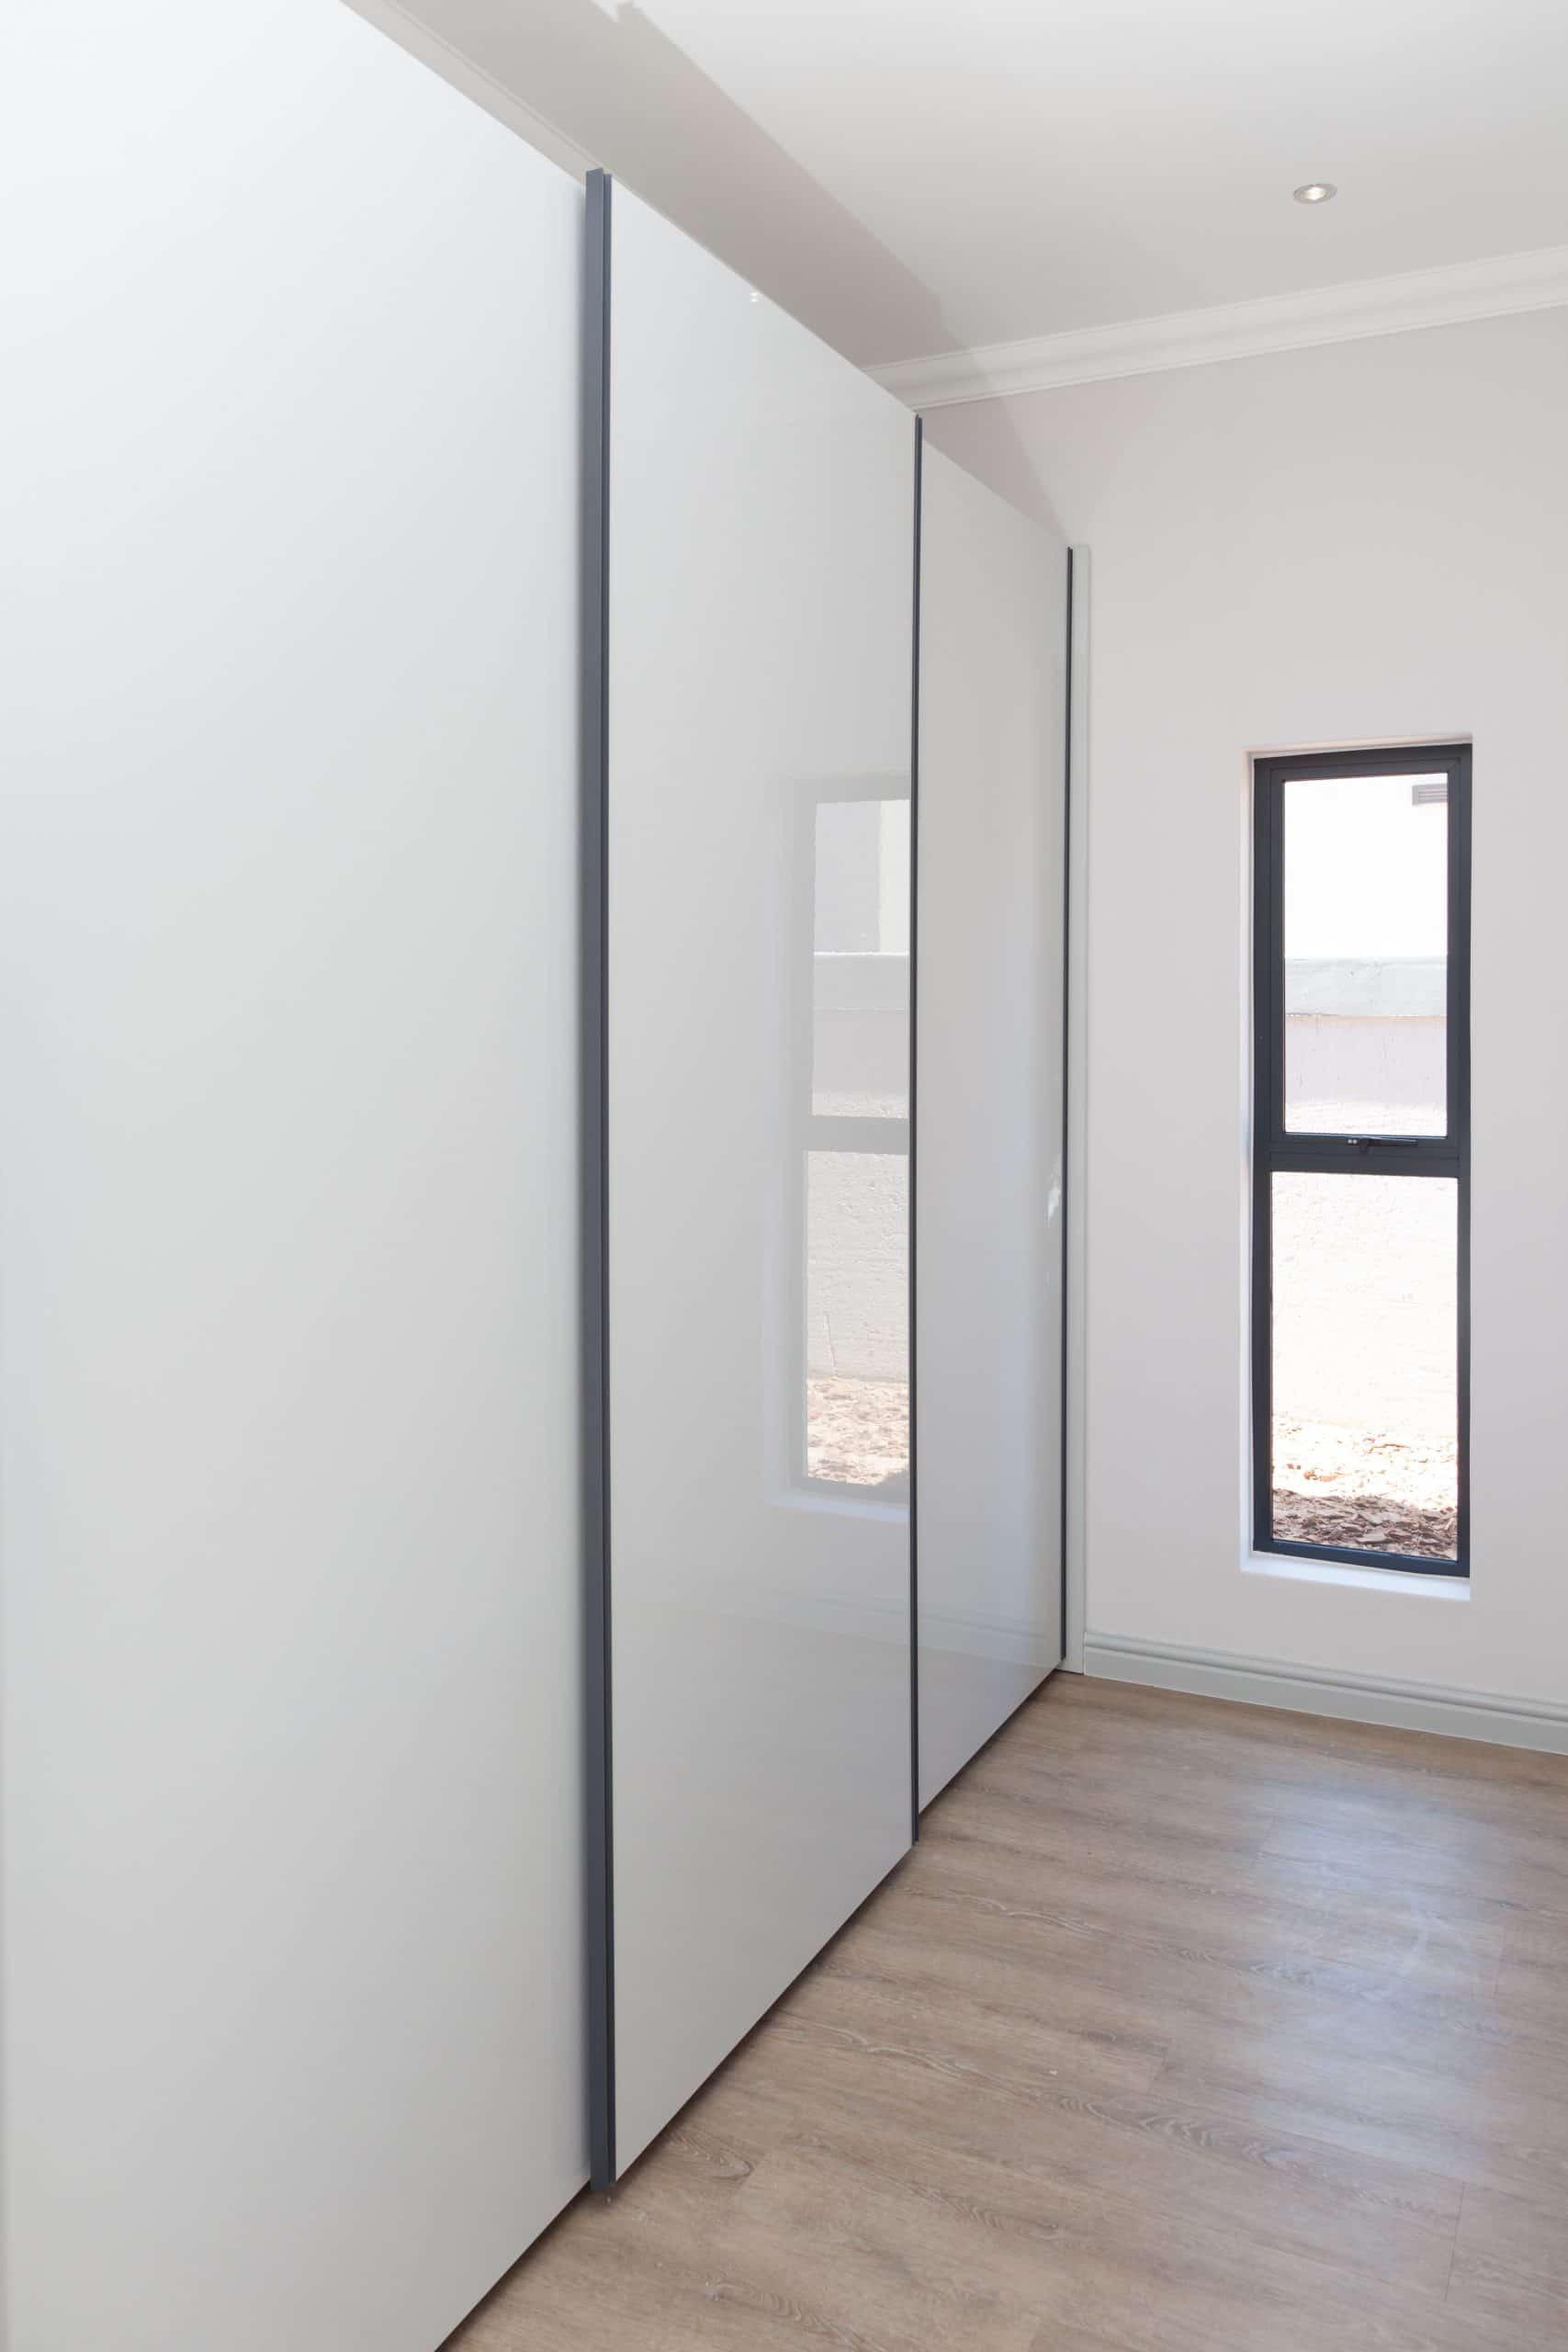 gloss bedroom sliding doors on wooden vynal flooring